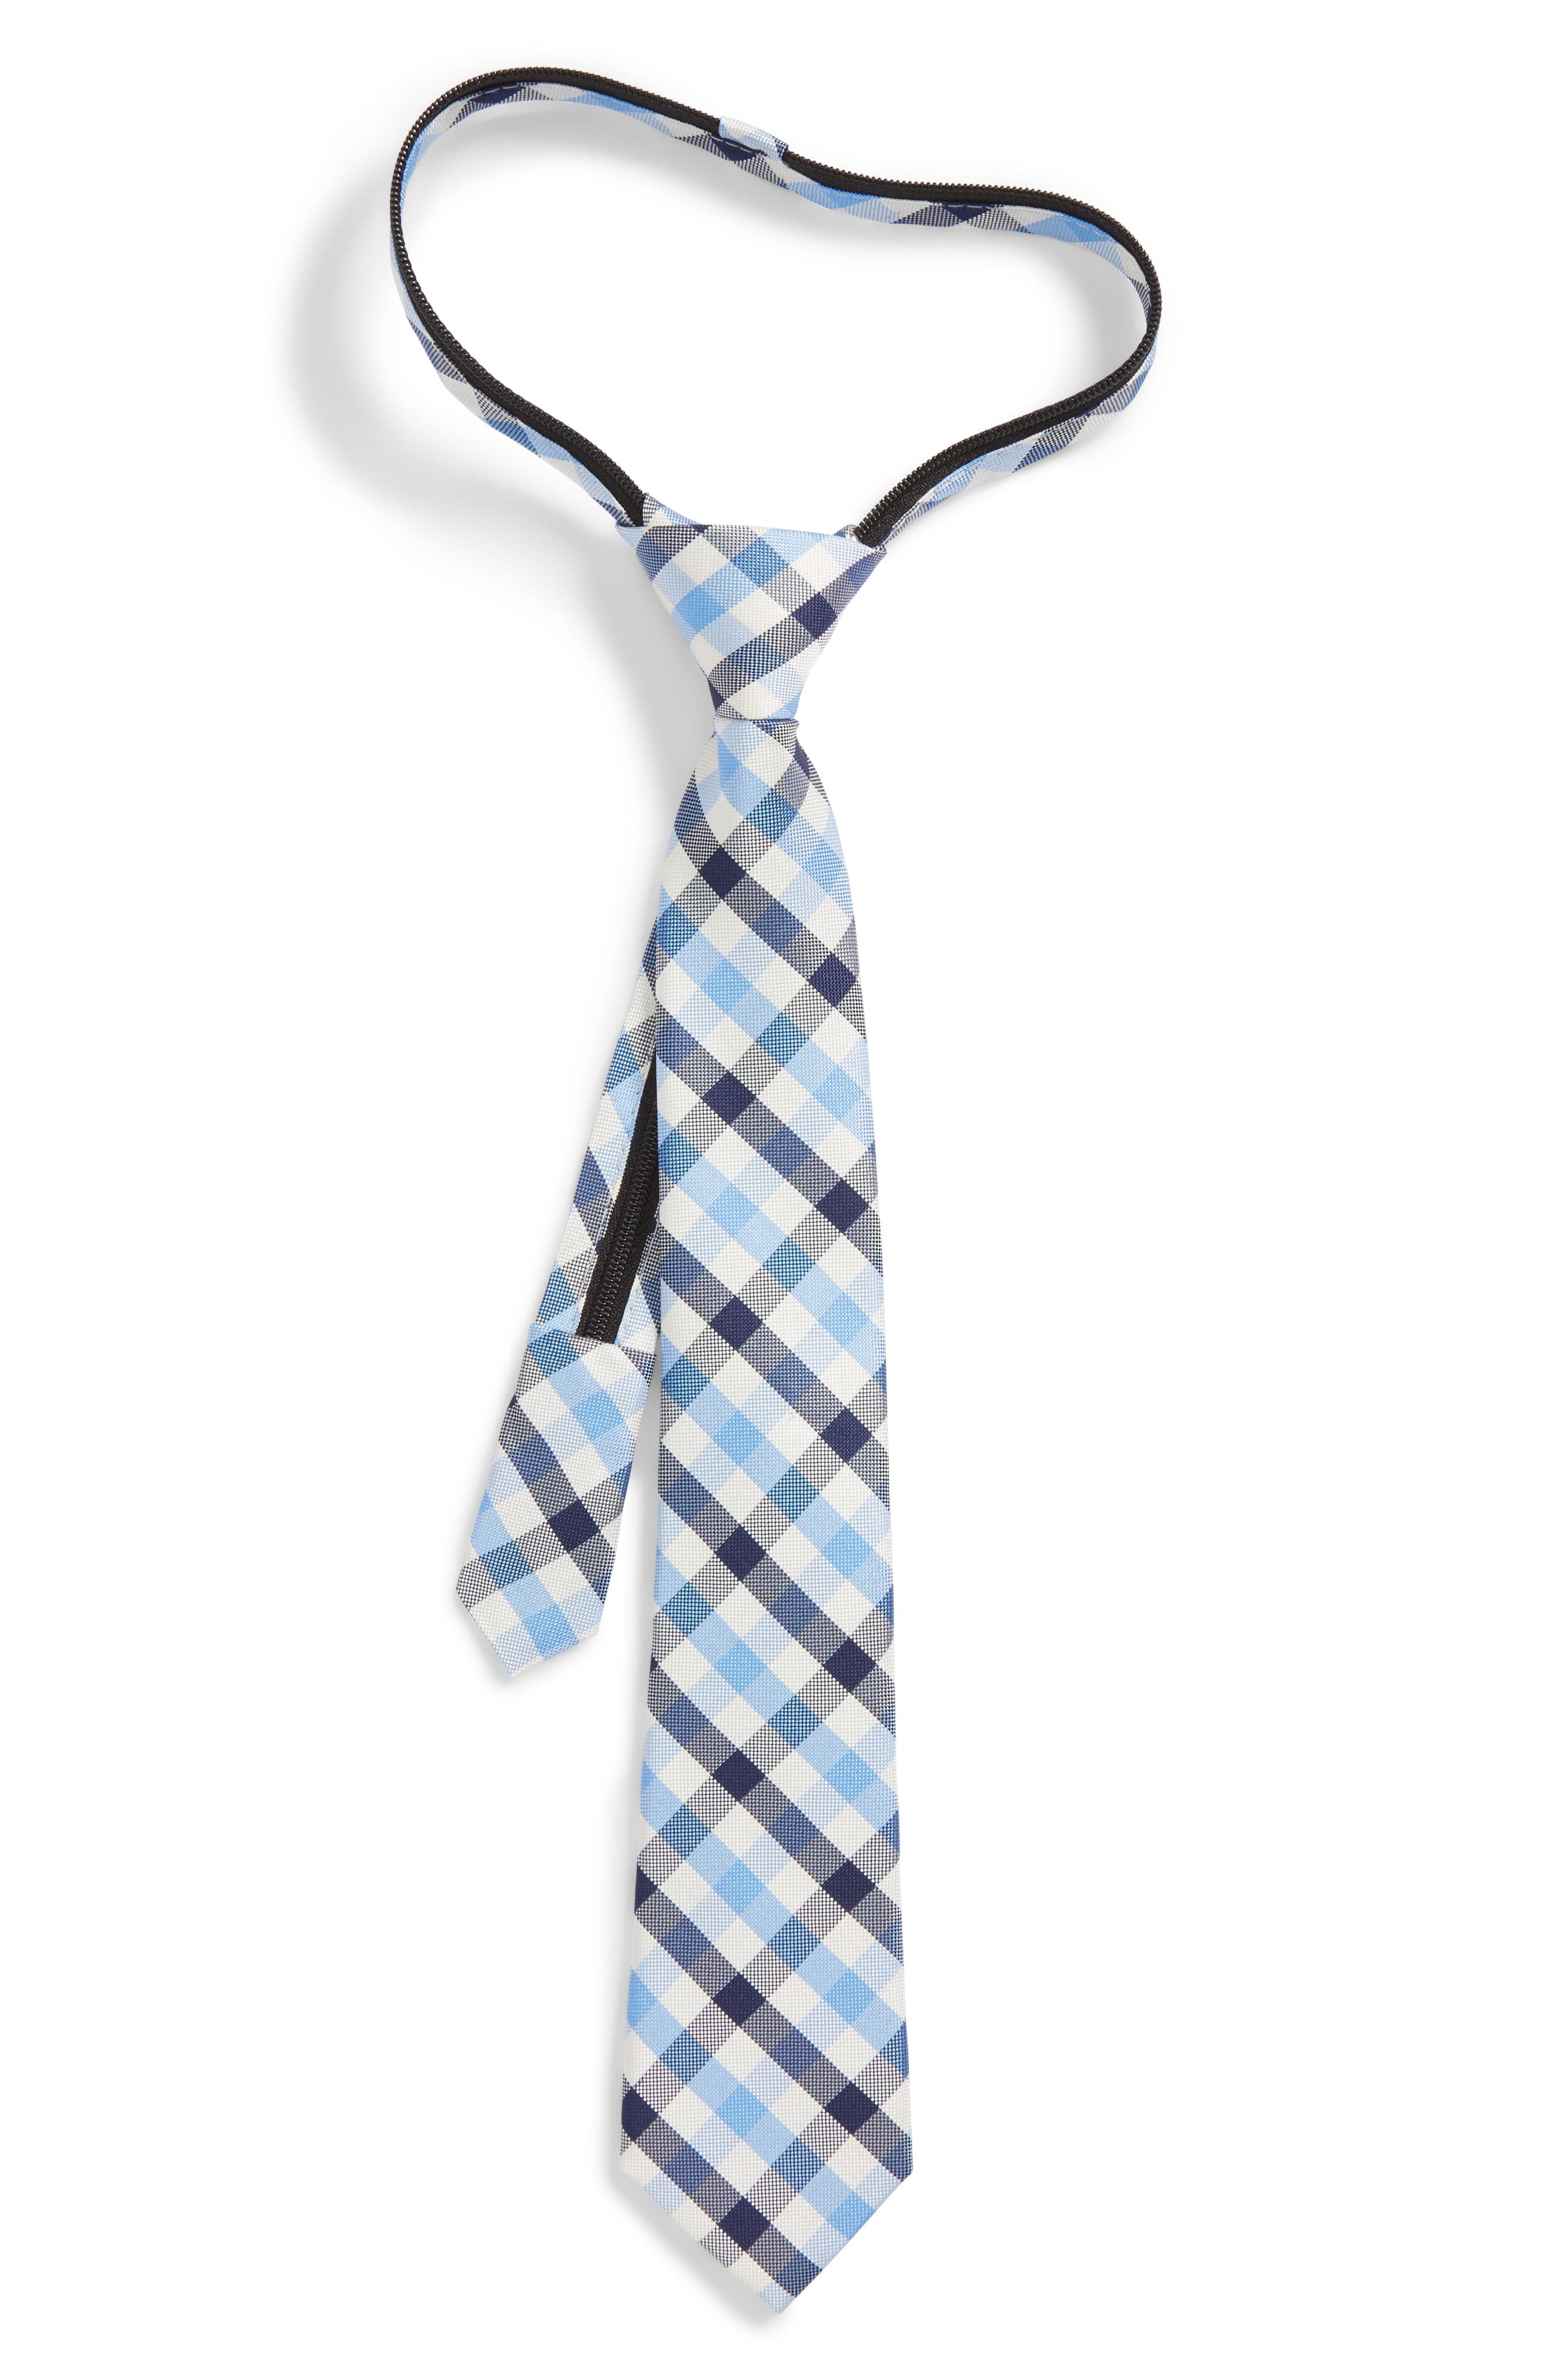 Window Plaid Silk Zip Tie,                             Main thumbnail 1, color,                             Light Blue